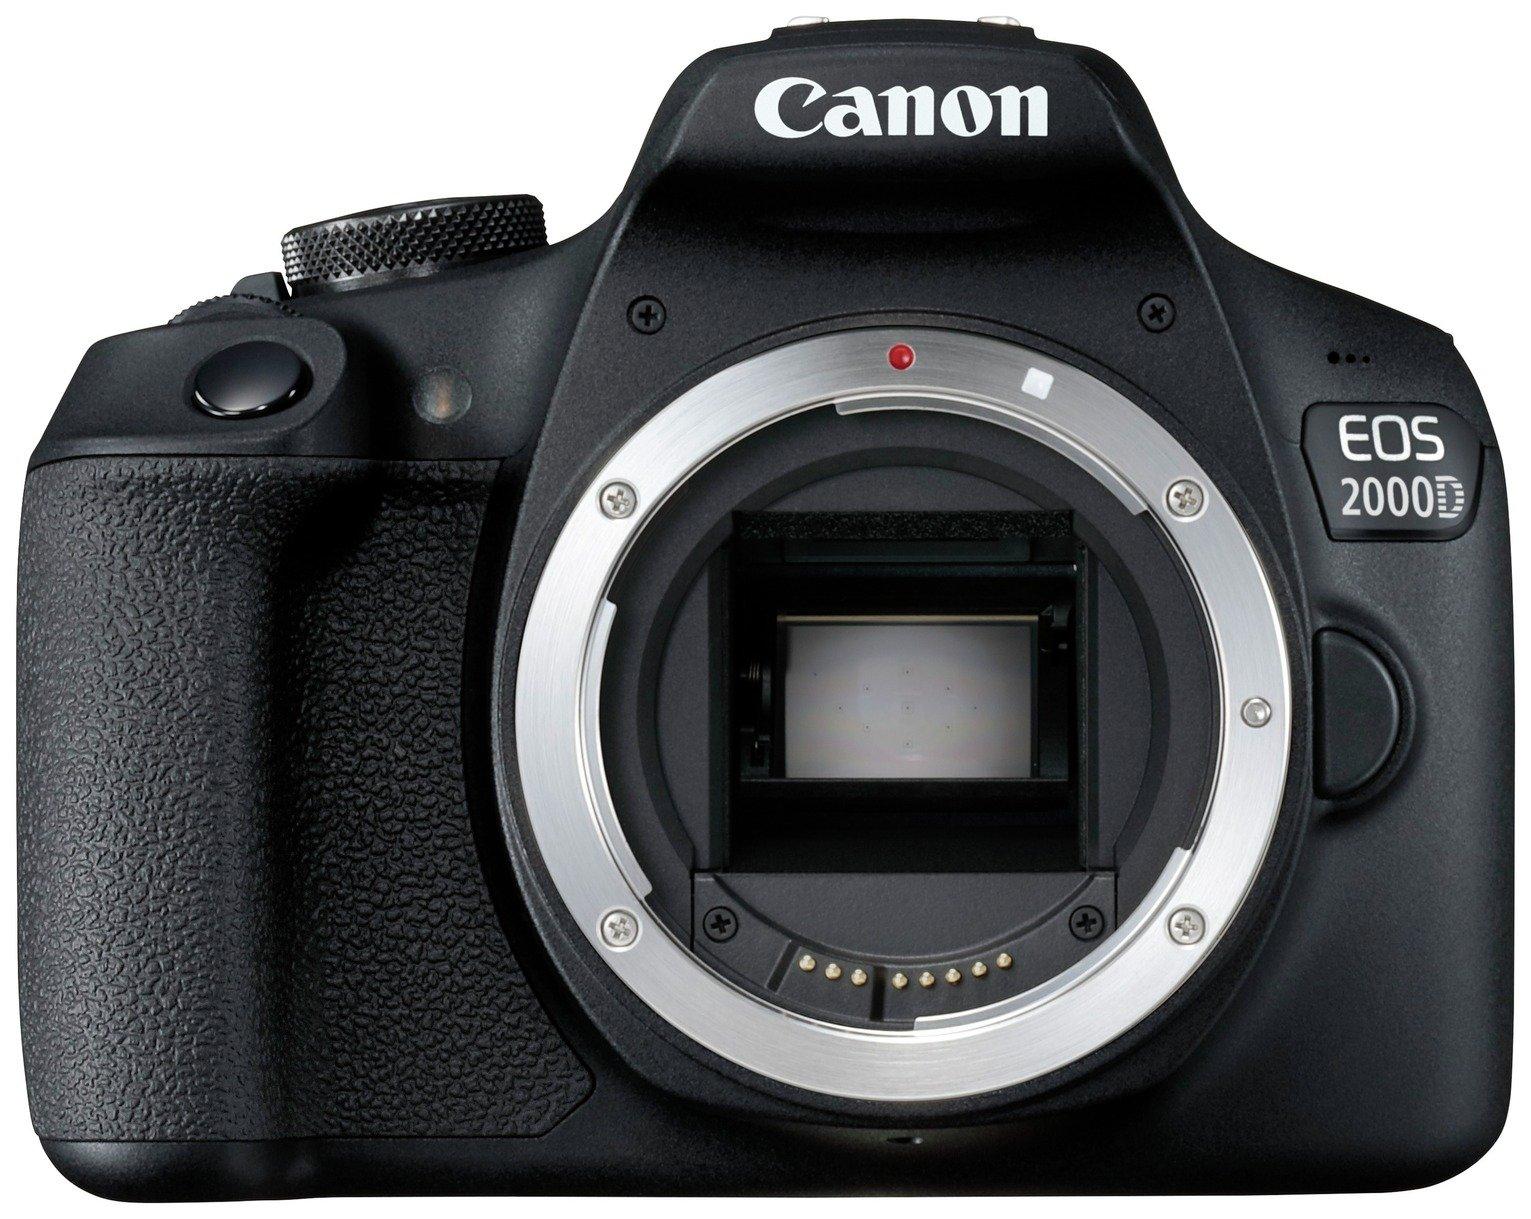 Image of Canon EOS 2000D DSLR Camera Body